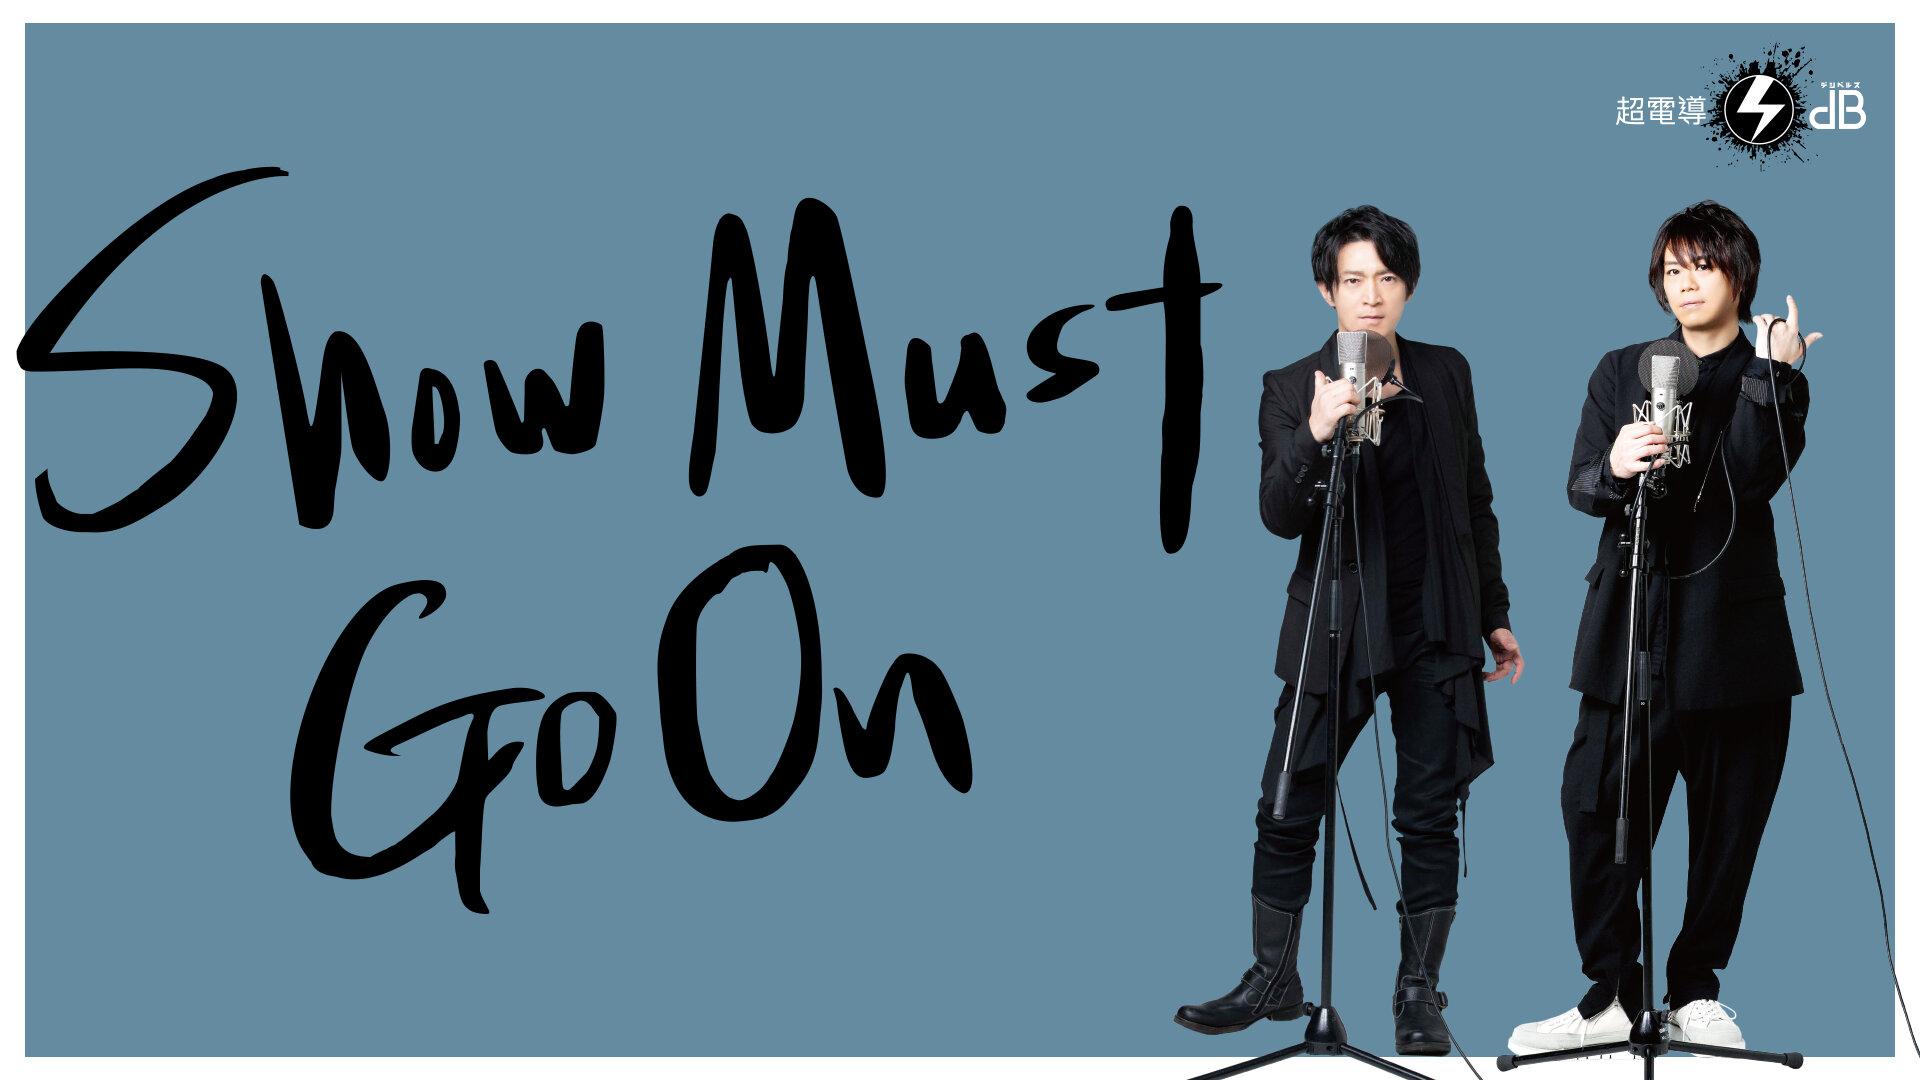 「SHOW MUST GO ON」(9月15日 夜・東京公演)(dアニメストア)